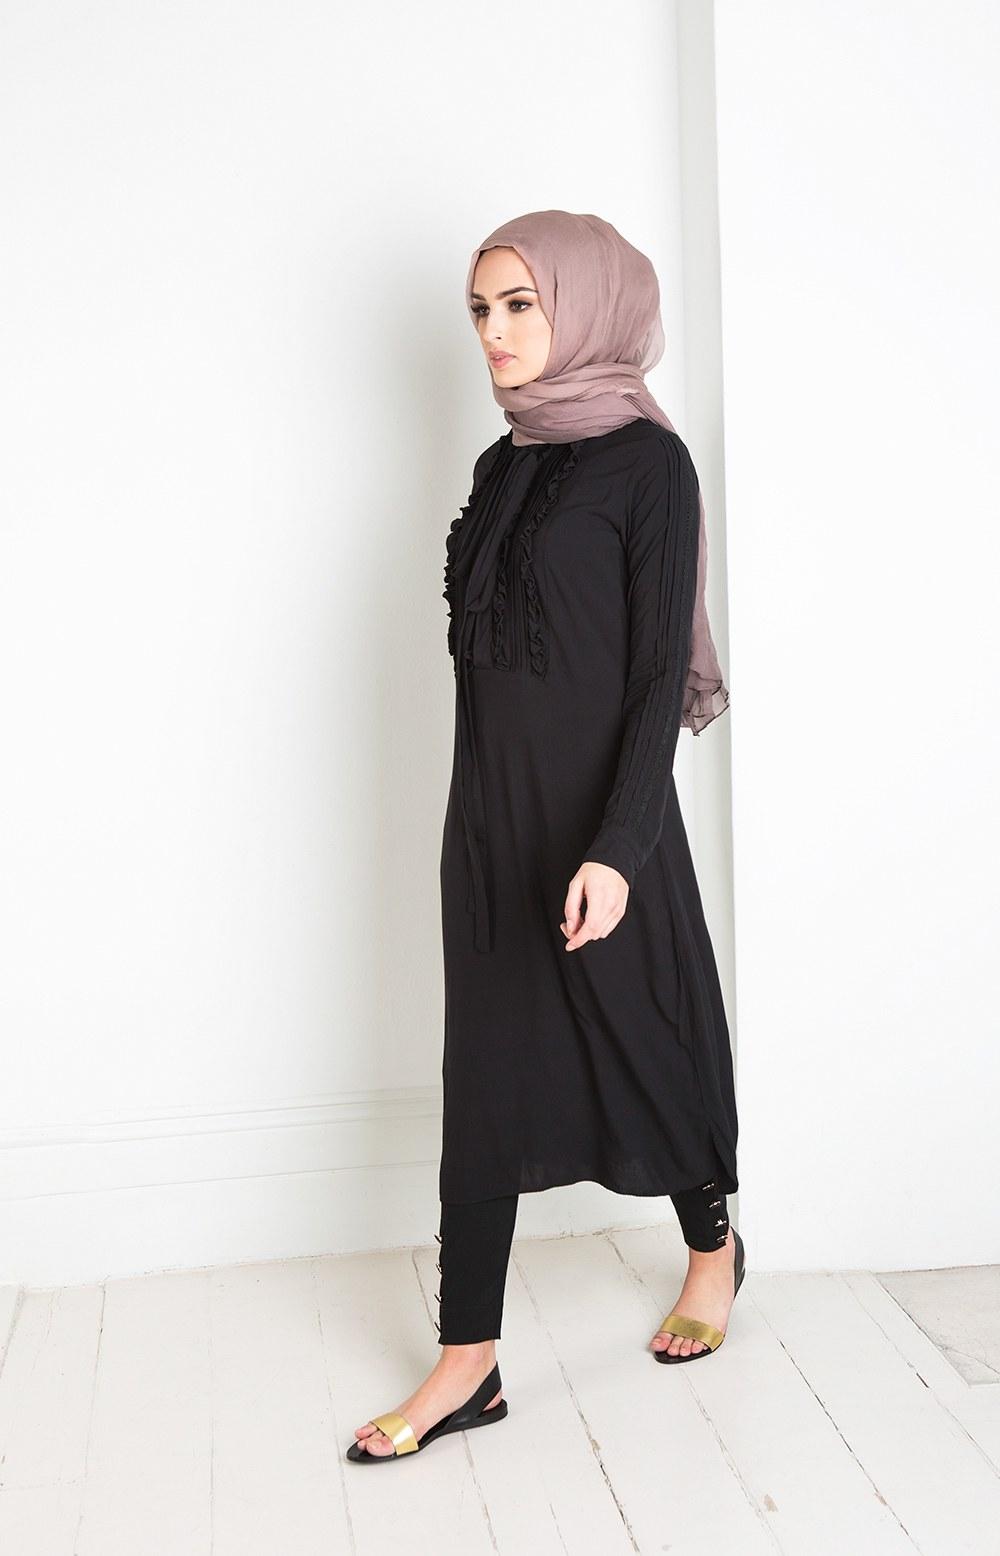 Ide Model Baju Lebaran Baru Budm 25 Trend Model Baju Muslim Lebaran 2018 Simple & Modis